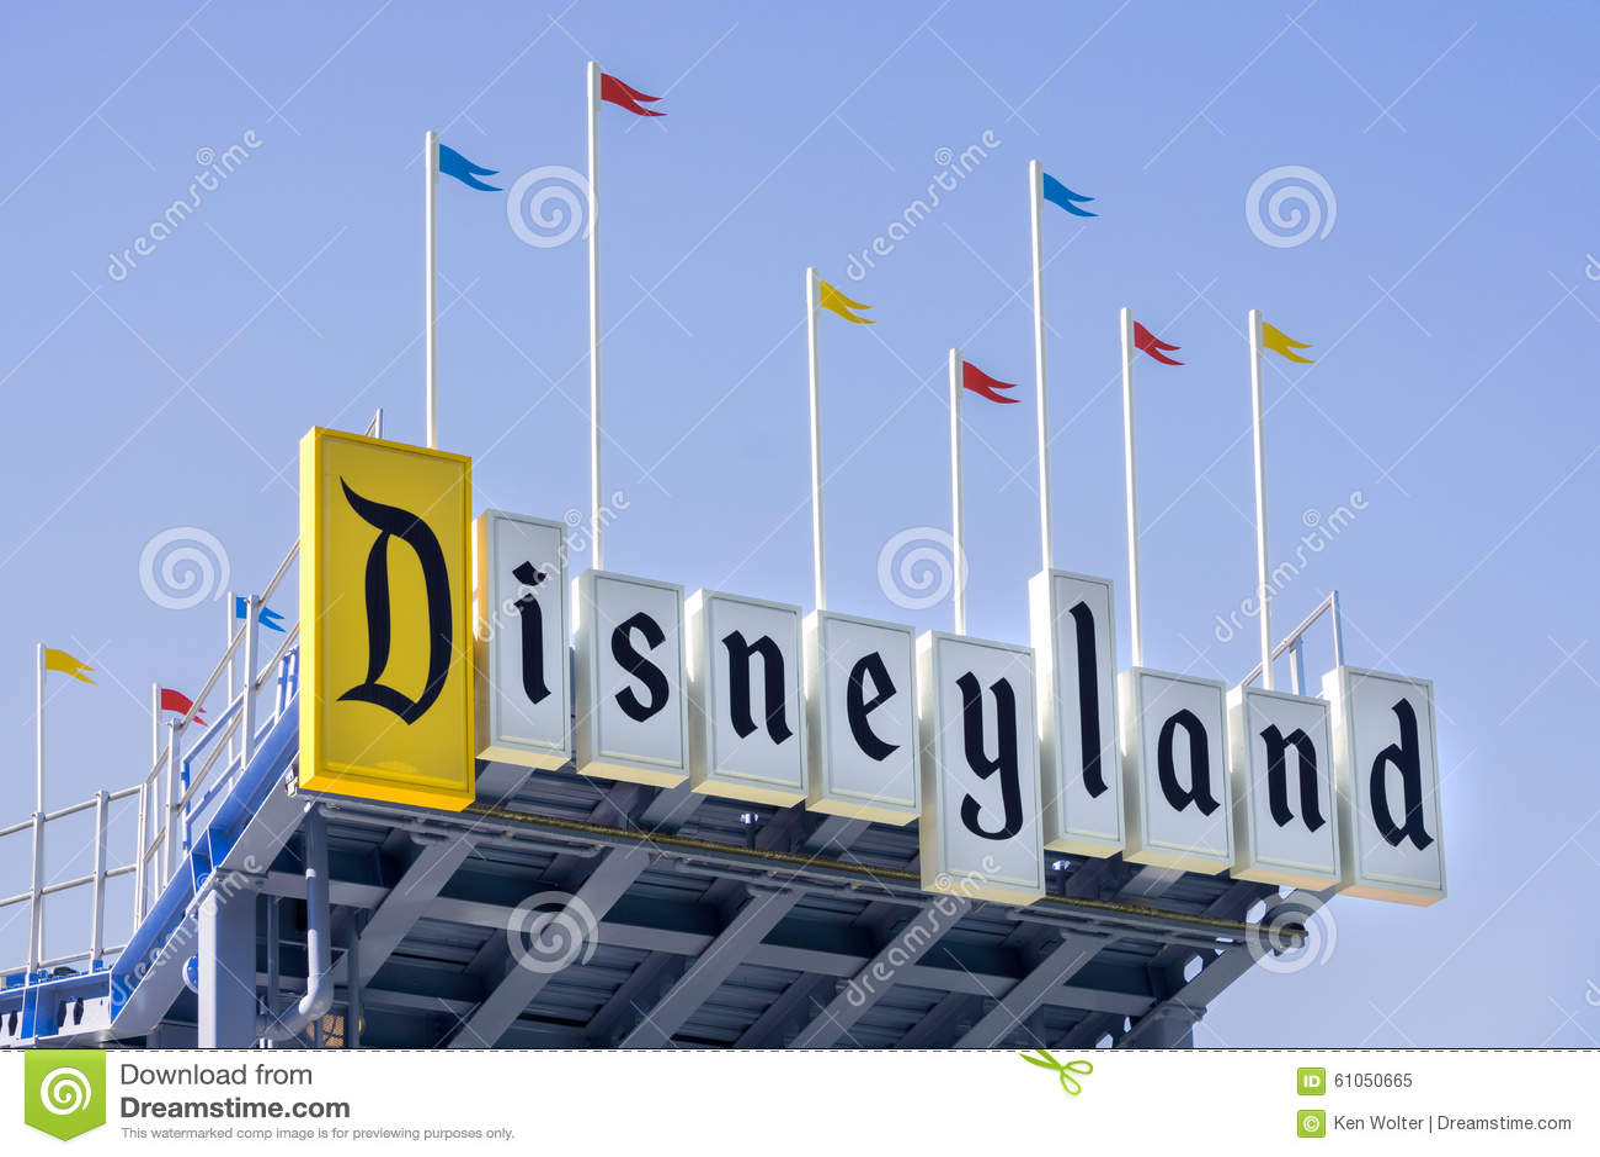 Disneyland Entrance Sign Editorial Image Image 61050665